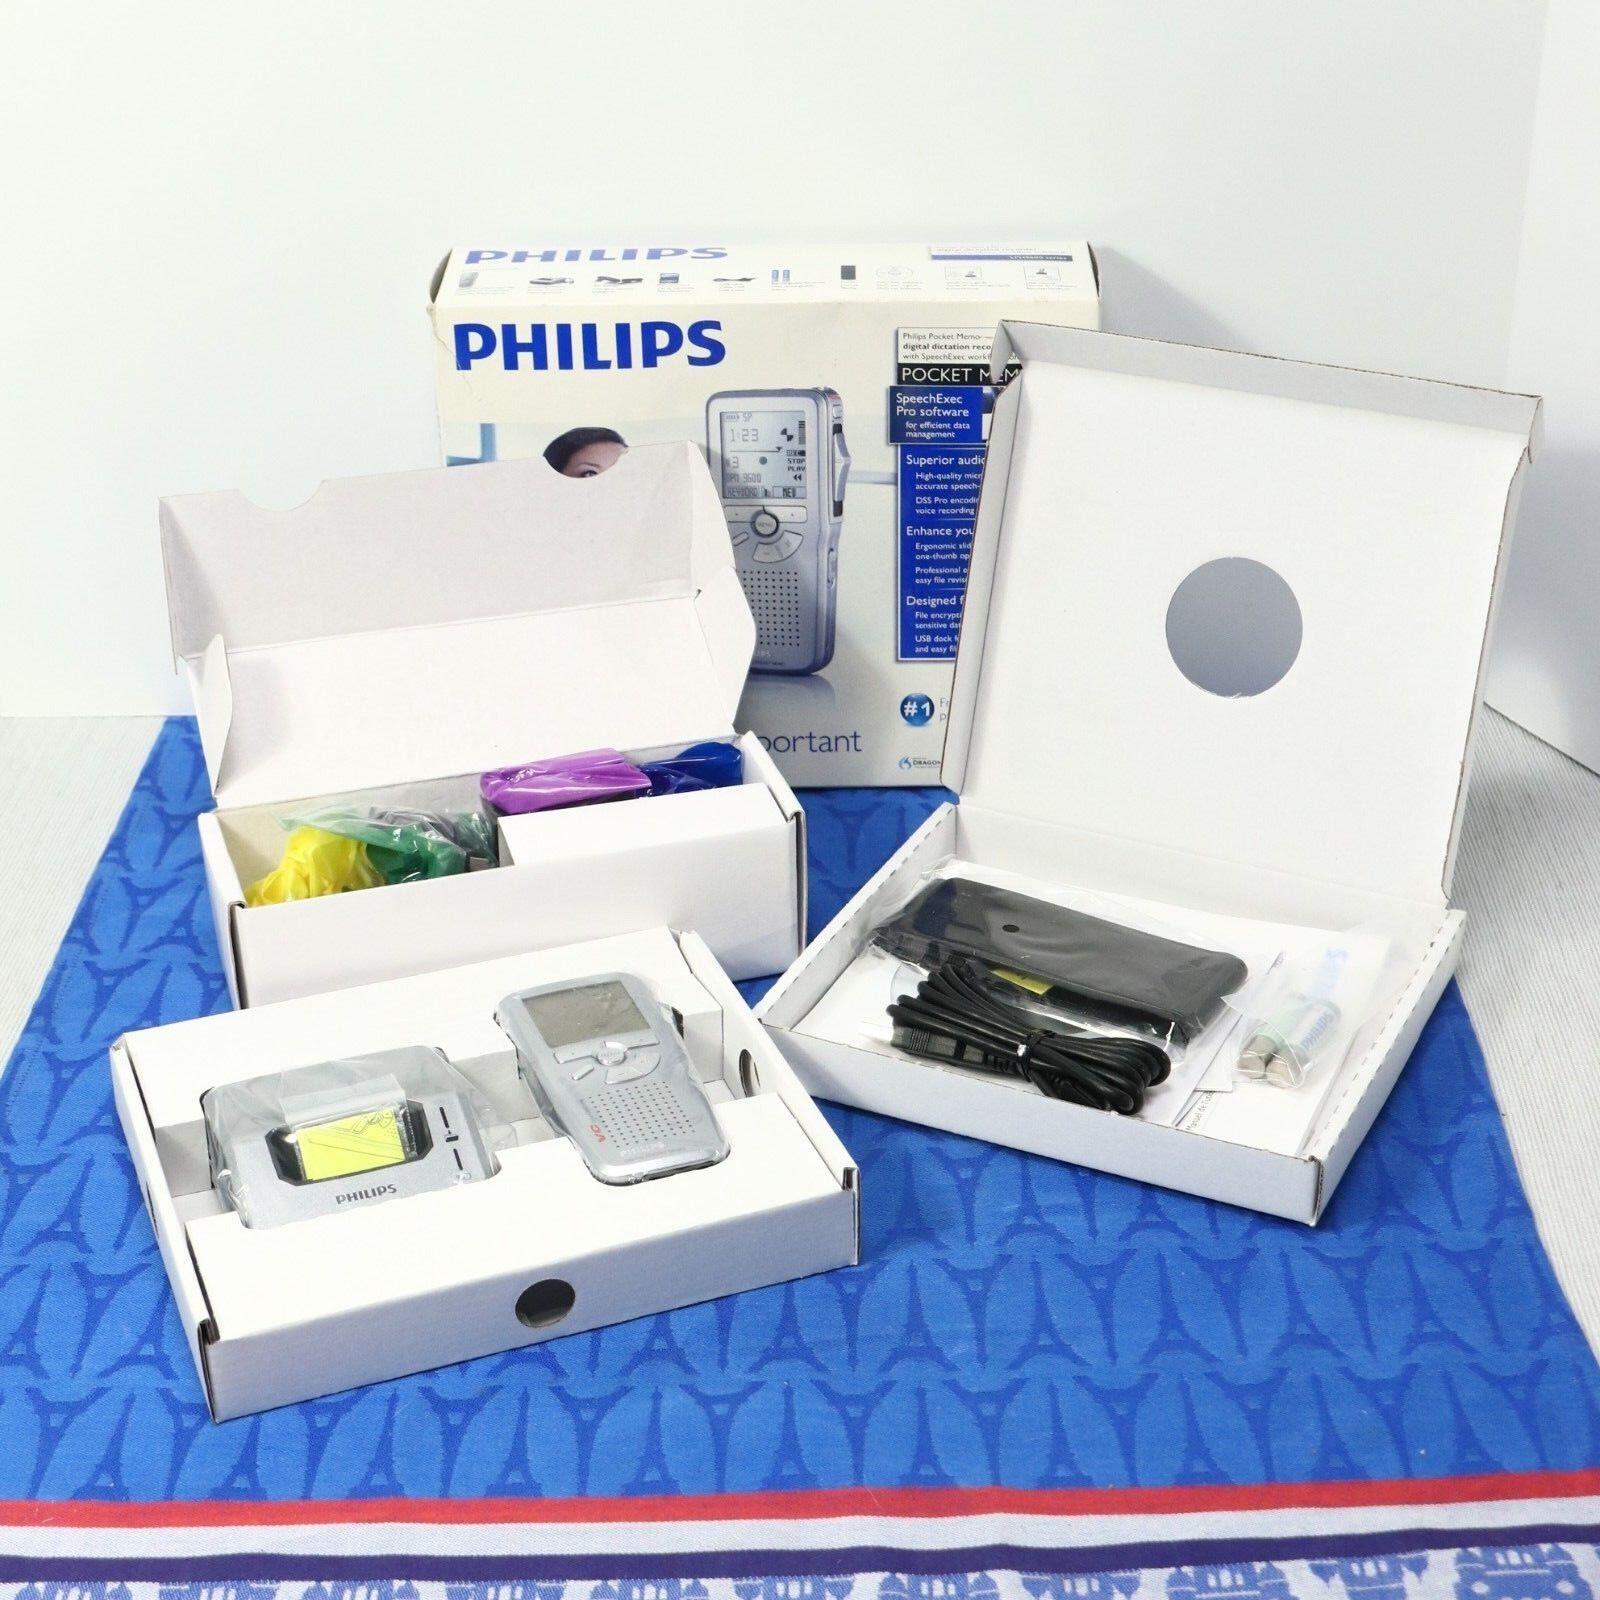 NEW IB! PHILIPS Pocket Memo LFH9600 Digital PRO DICTATION RECORDER w/ SpeechExec